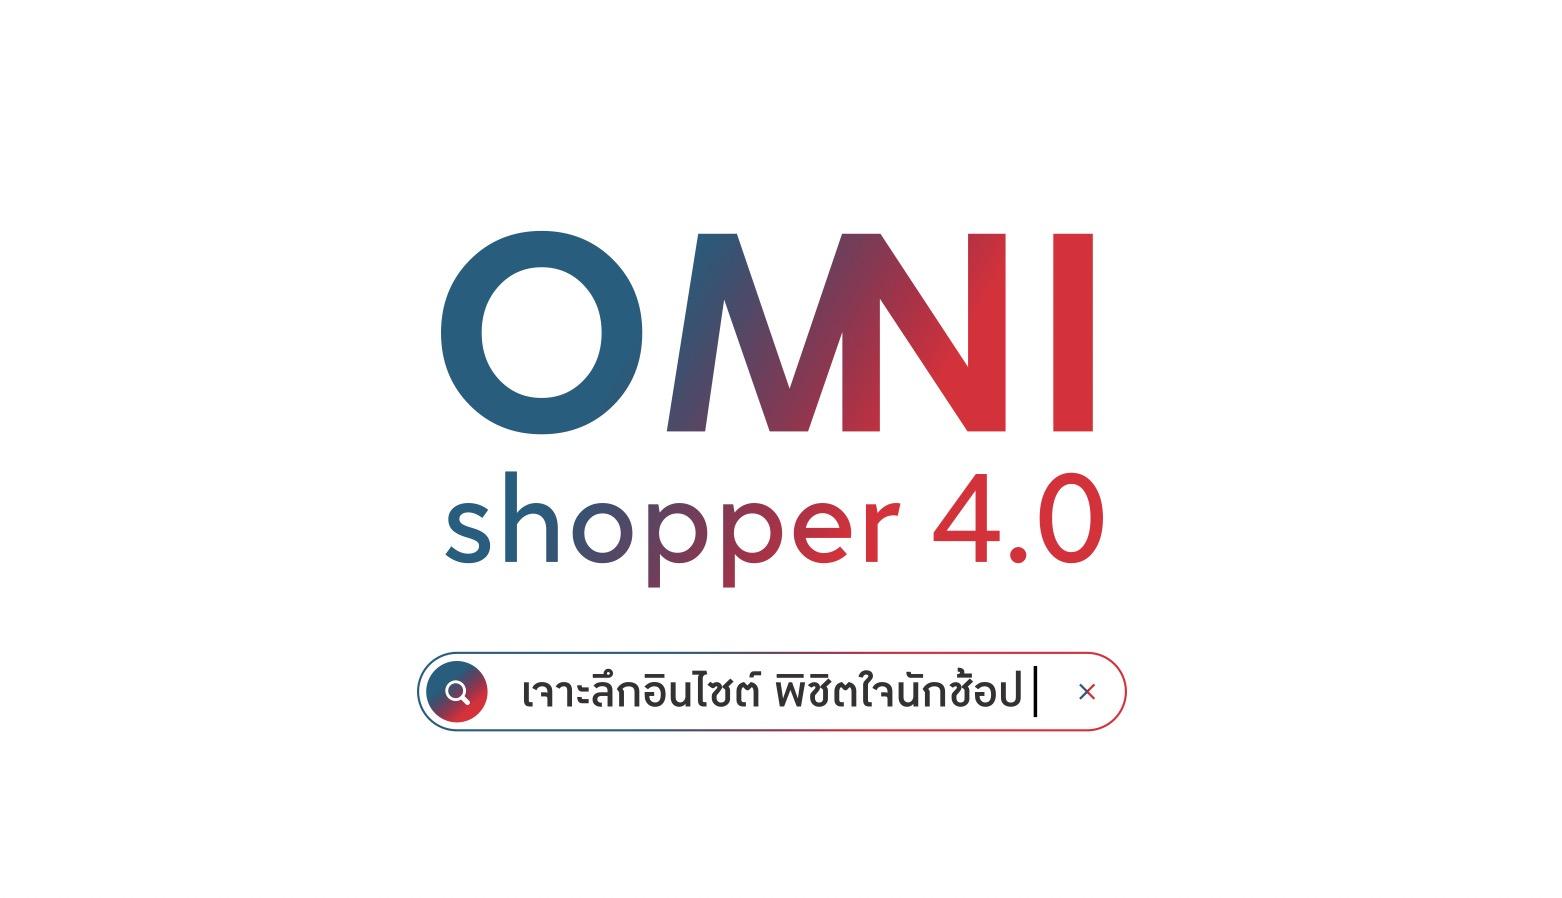 OMNI Shopper เจาะลึกอินไซต์พิชิตใจนักช๊อป 4.0  Online – Offline แบบไหนถึงพอดี?